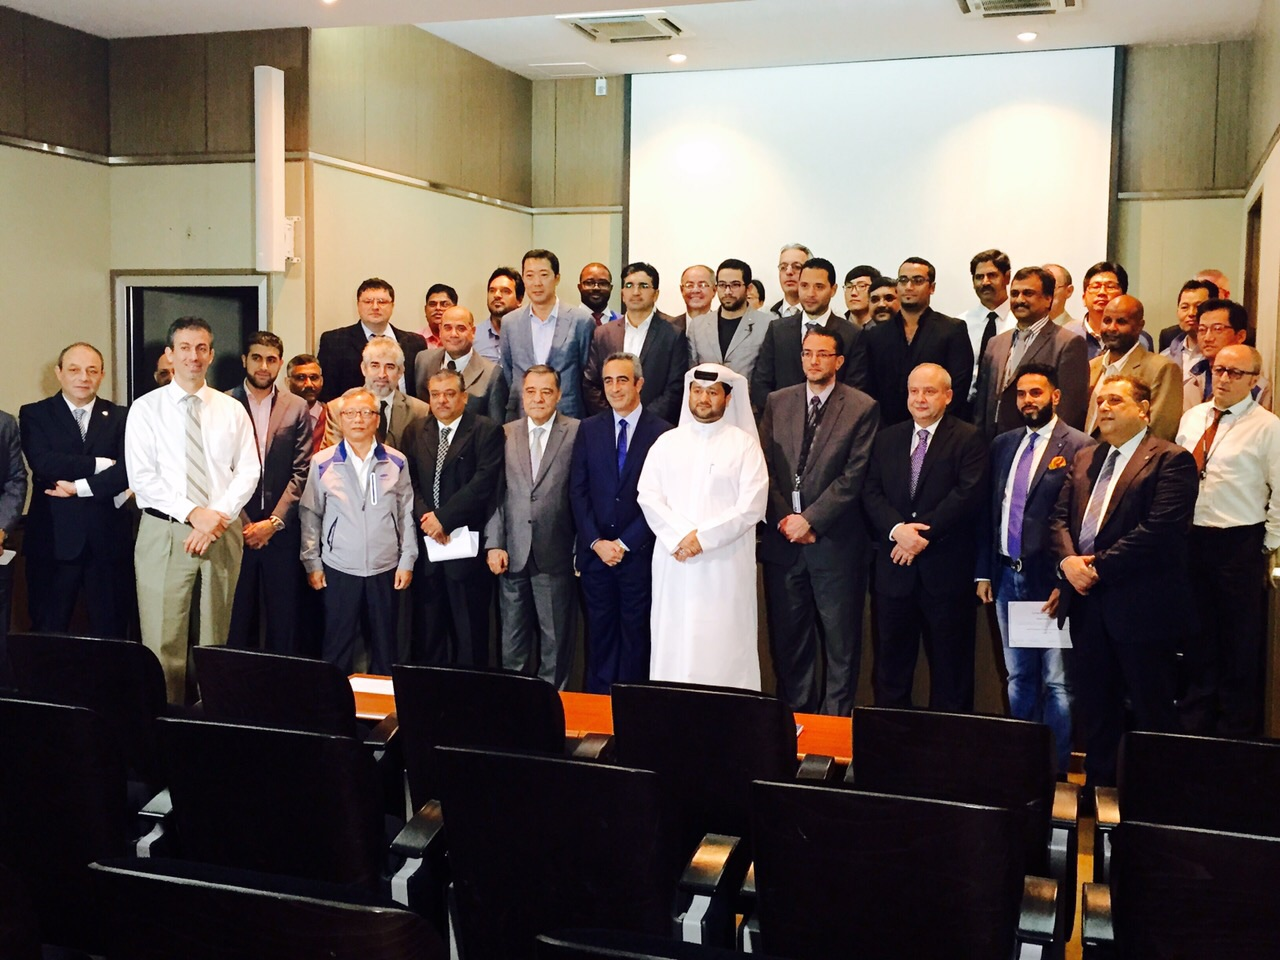 Mr.   Deya Hamad  ,Mr.   Farouk Abdelaziz  & Mr.   Nidal Salameh   of MACE Qatar, togetherwiththe Lusail Management Team